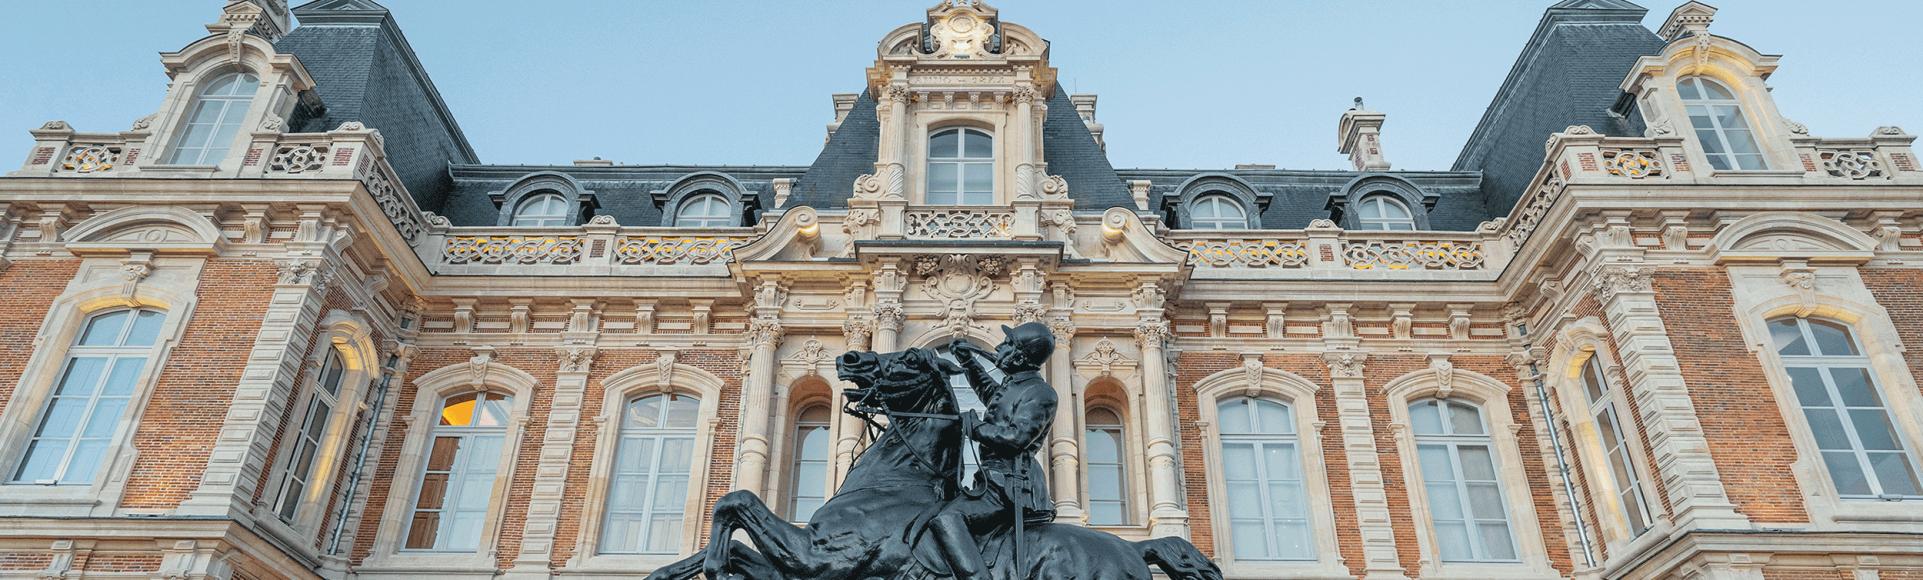 Château Perrier